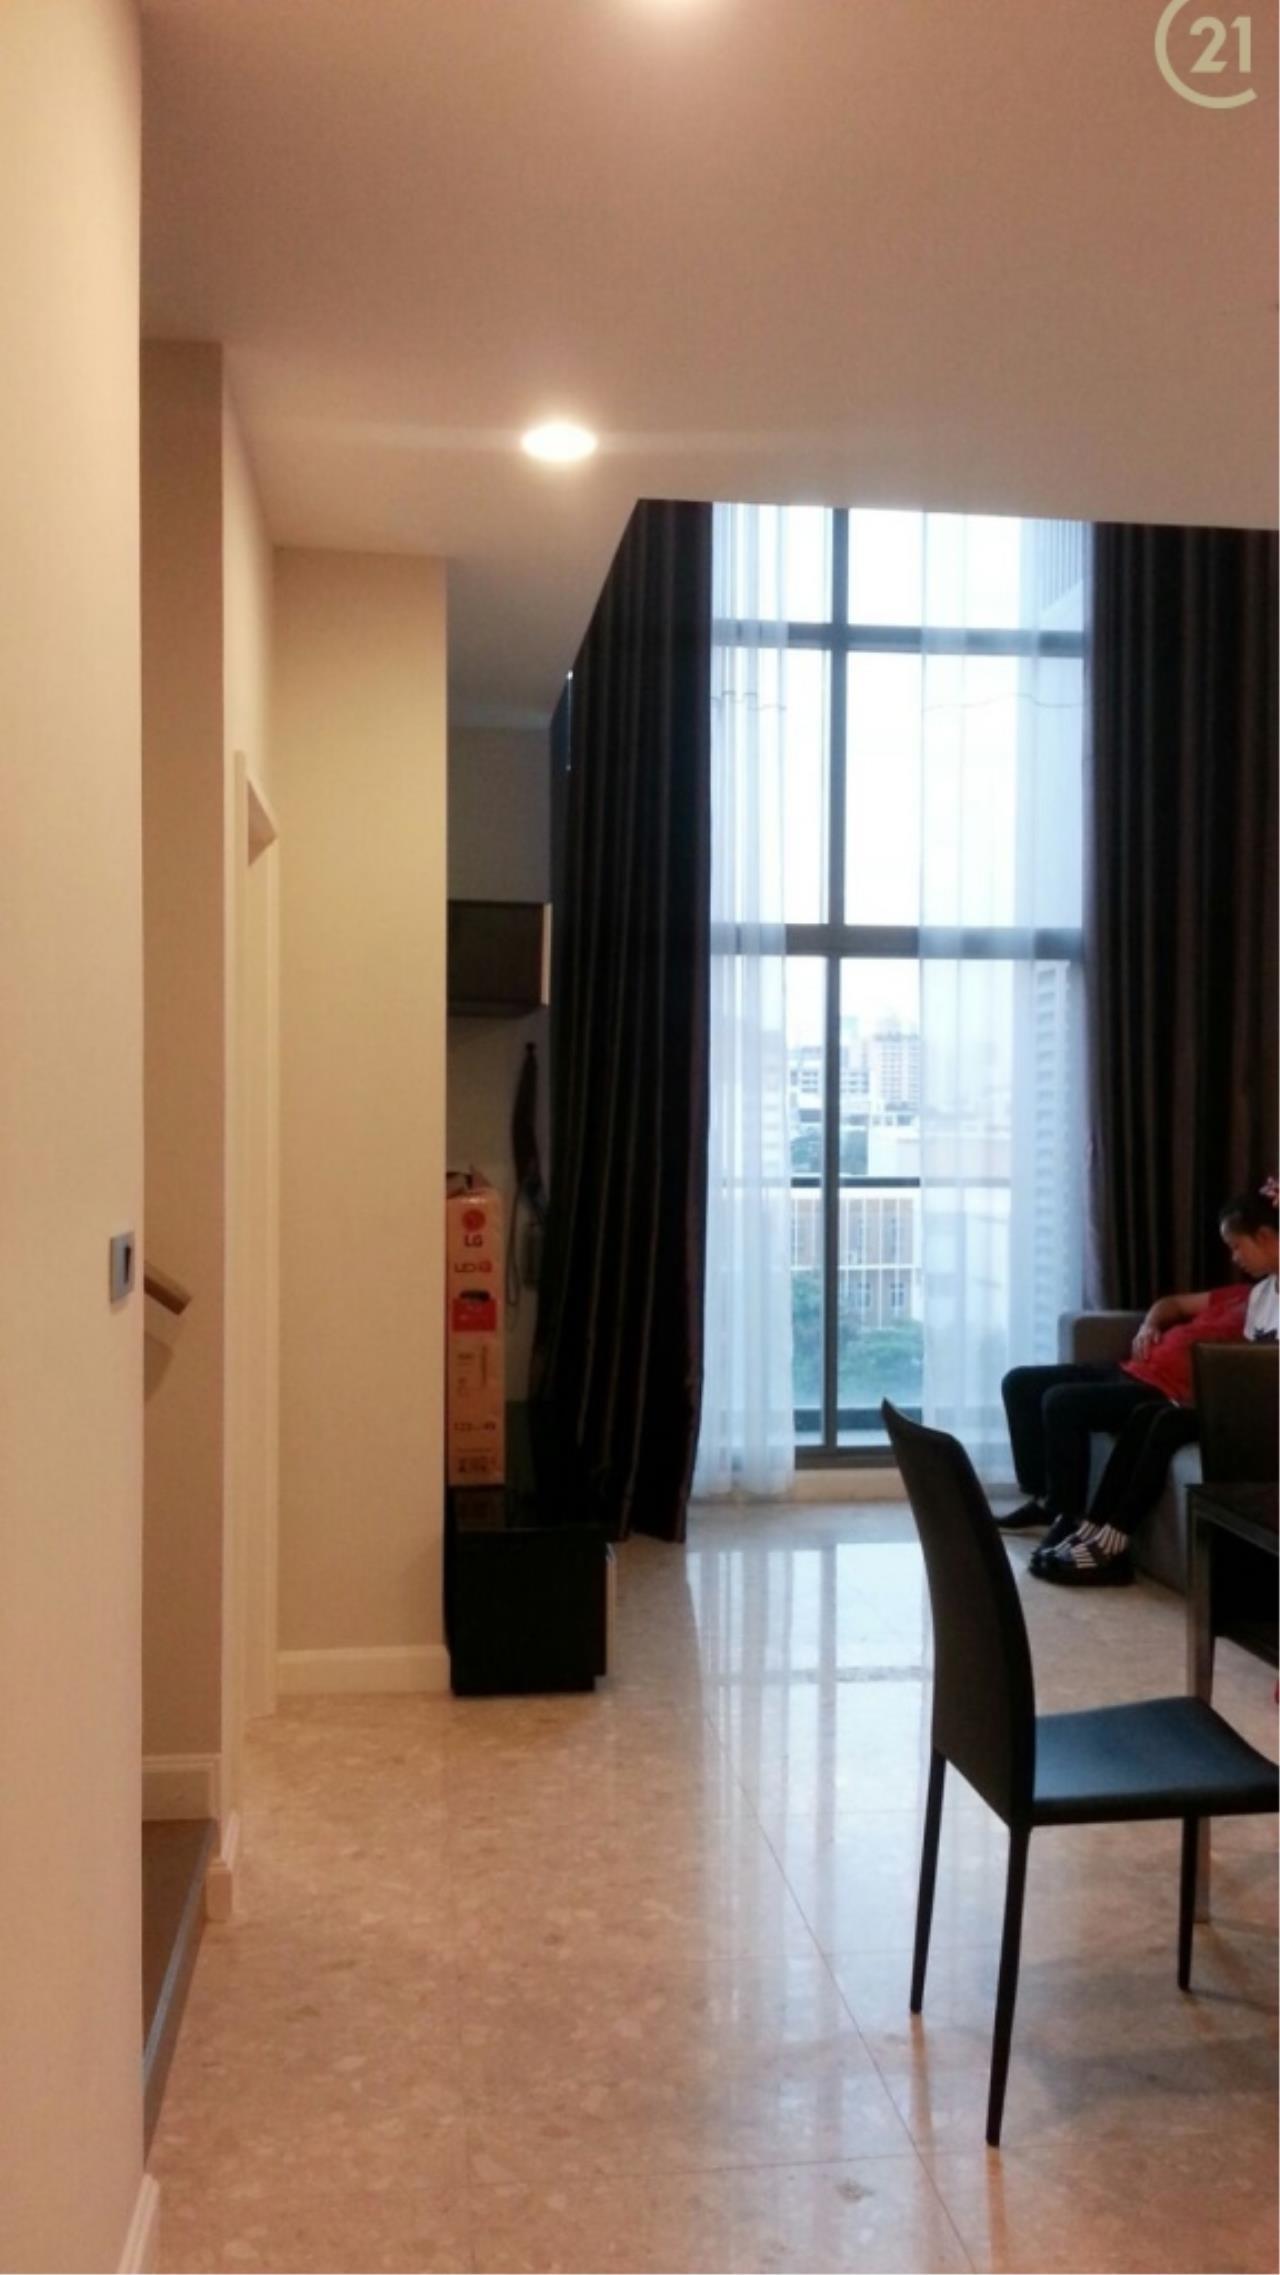 Century21 Skylux Agency's The Crest Sukhumvit 34 / Condo For Sale / 2 Bedroom / 86.05 SQM / BTS Thong Lo / Bangkok 1